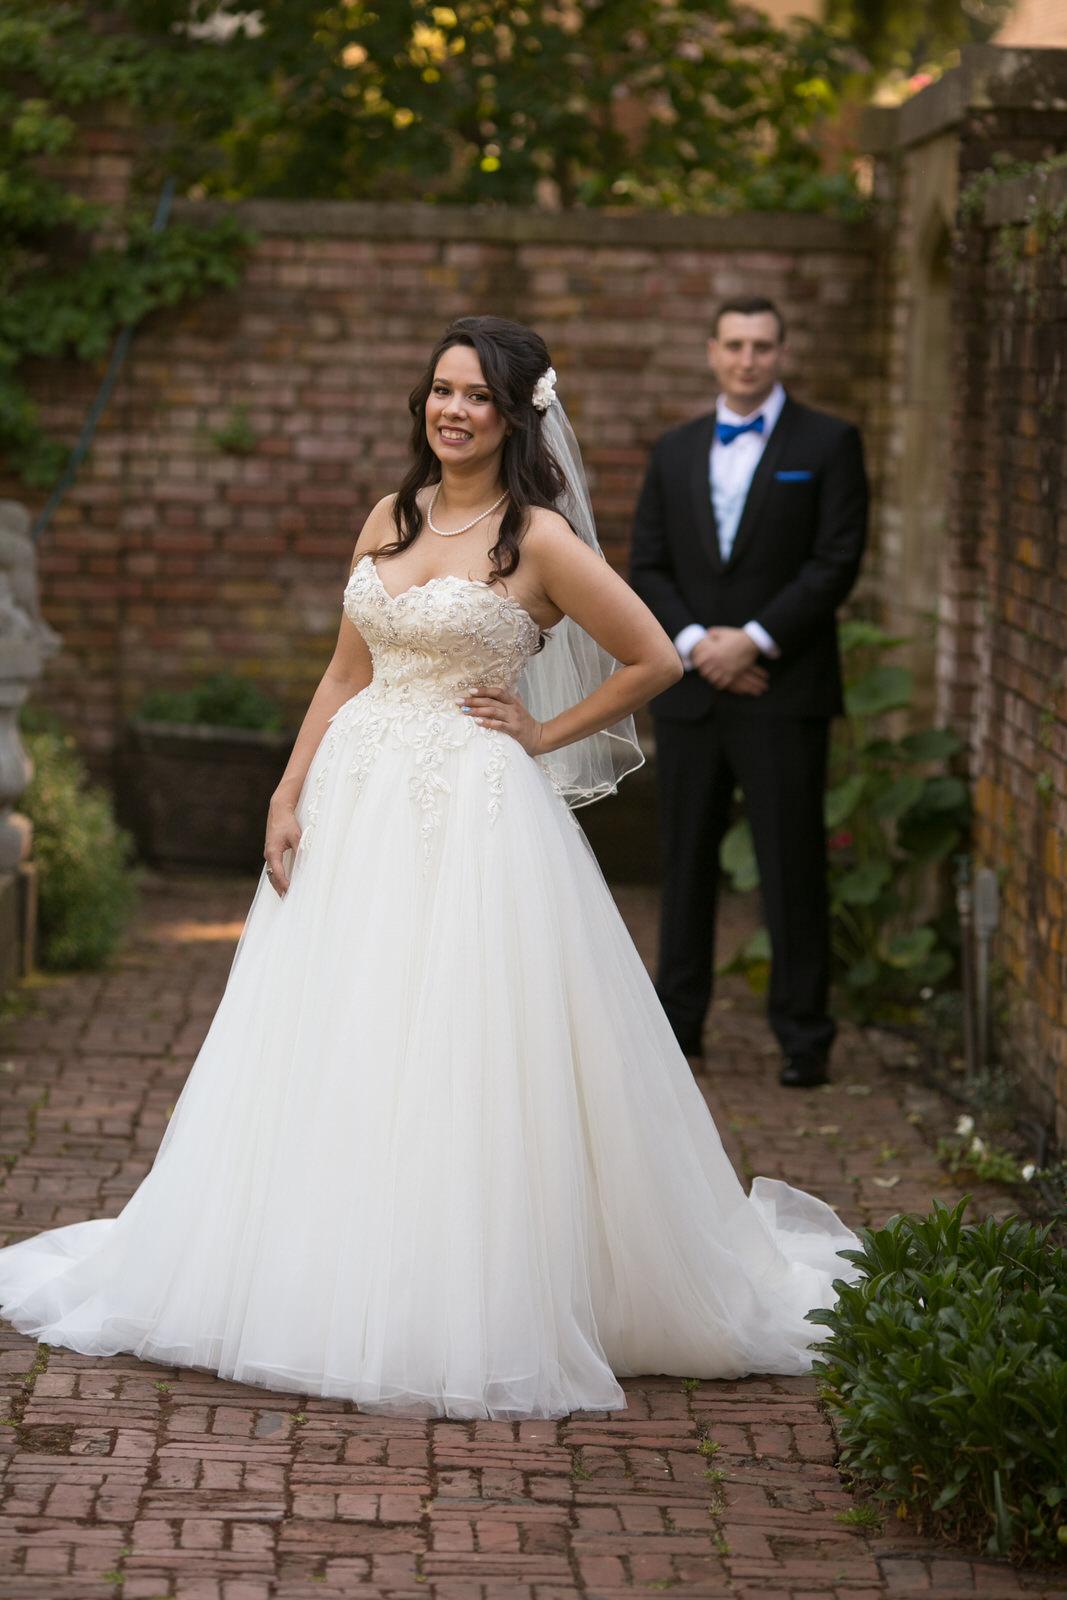 Thornewood Castle Wedding Kate and Daniel Wedding Web14.jpg